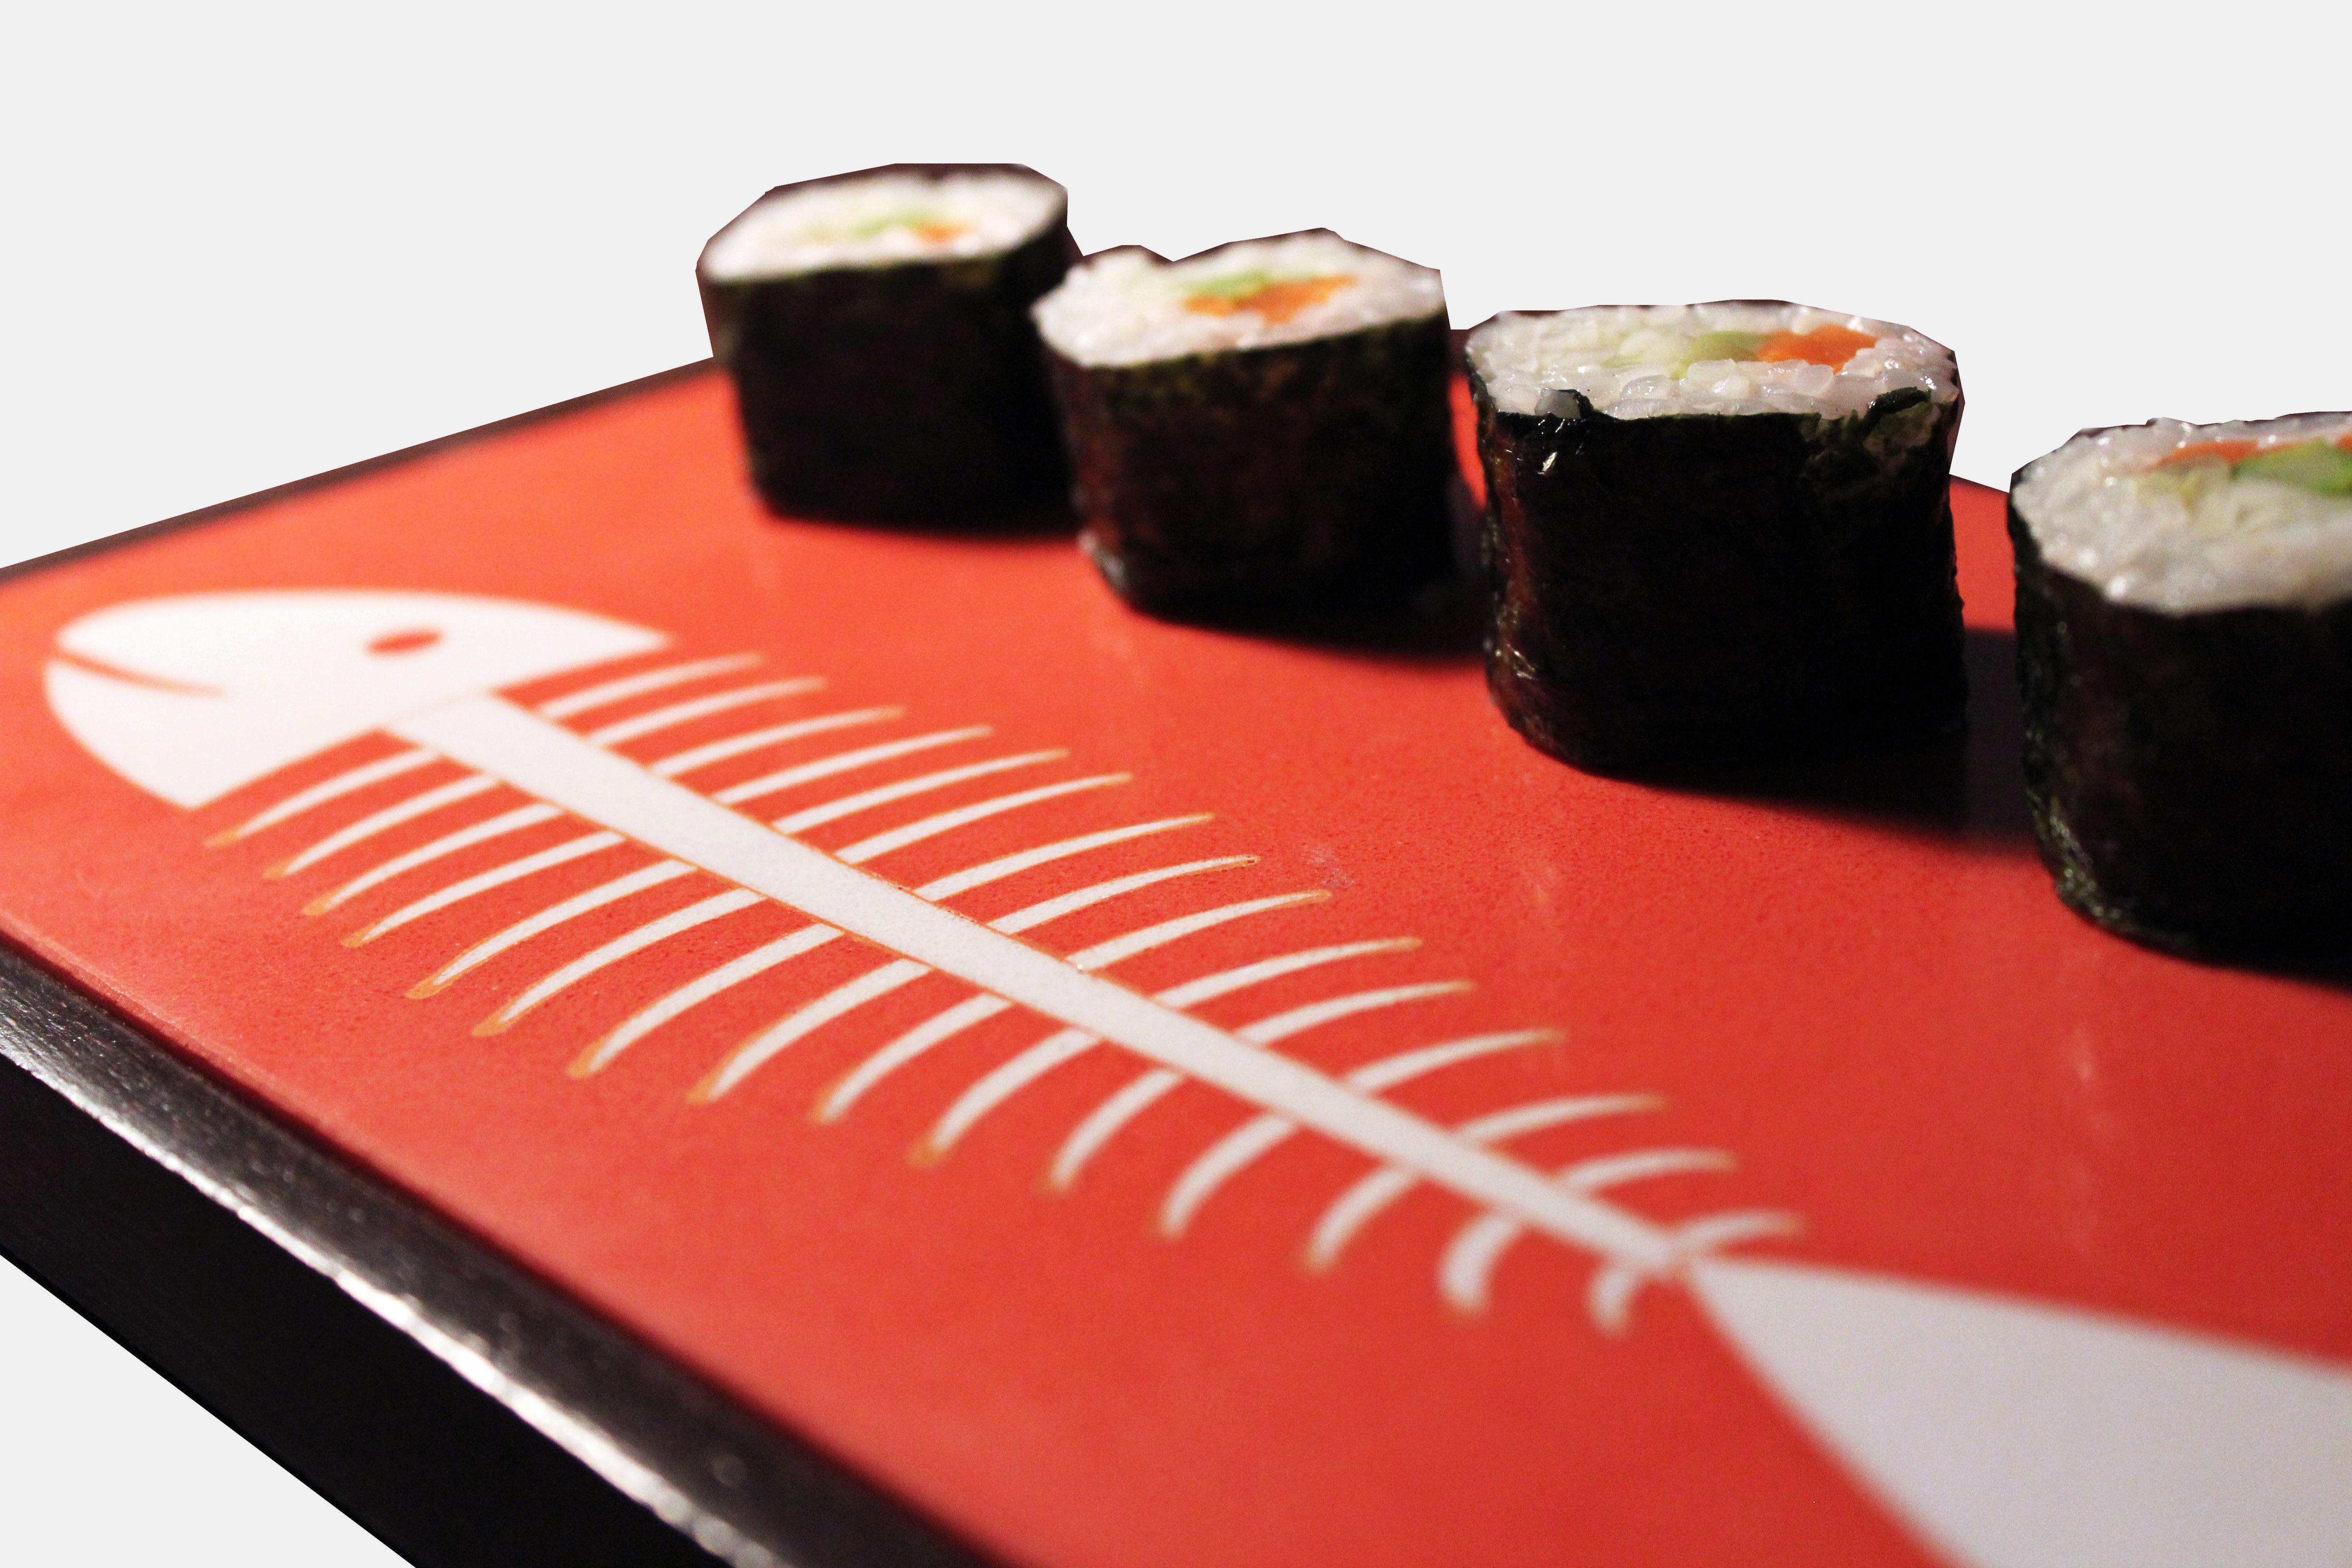 The Sushi Paten